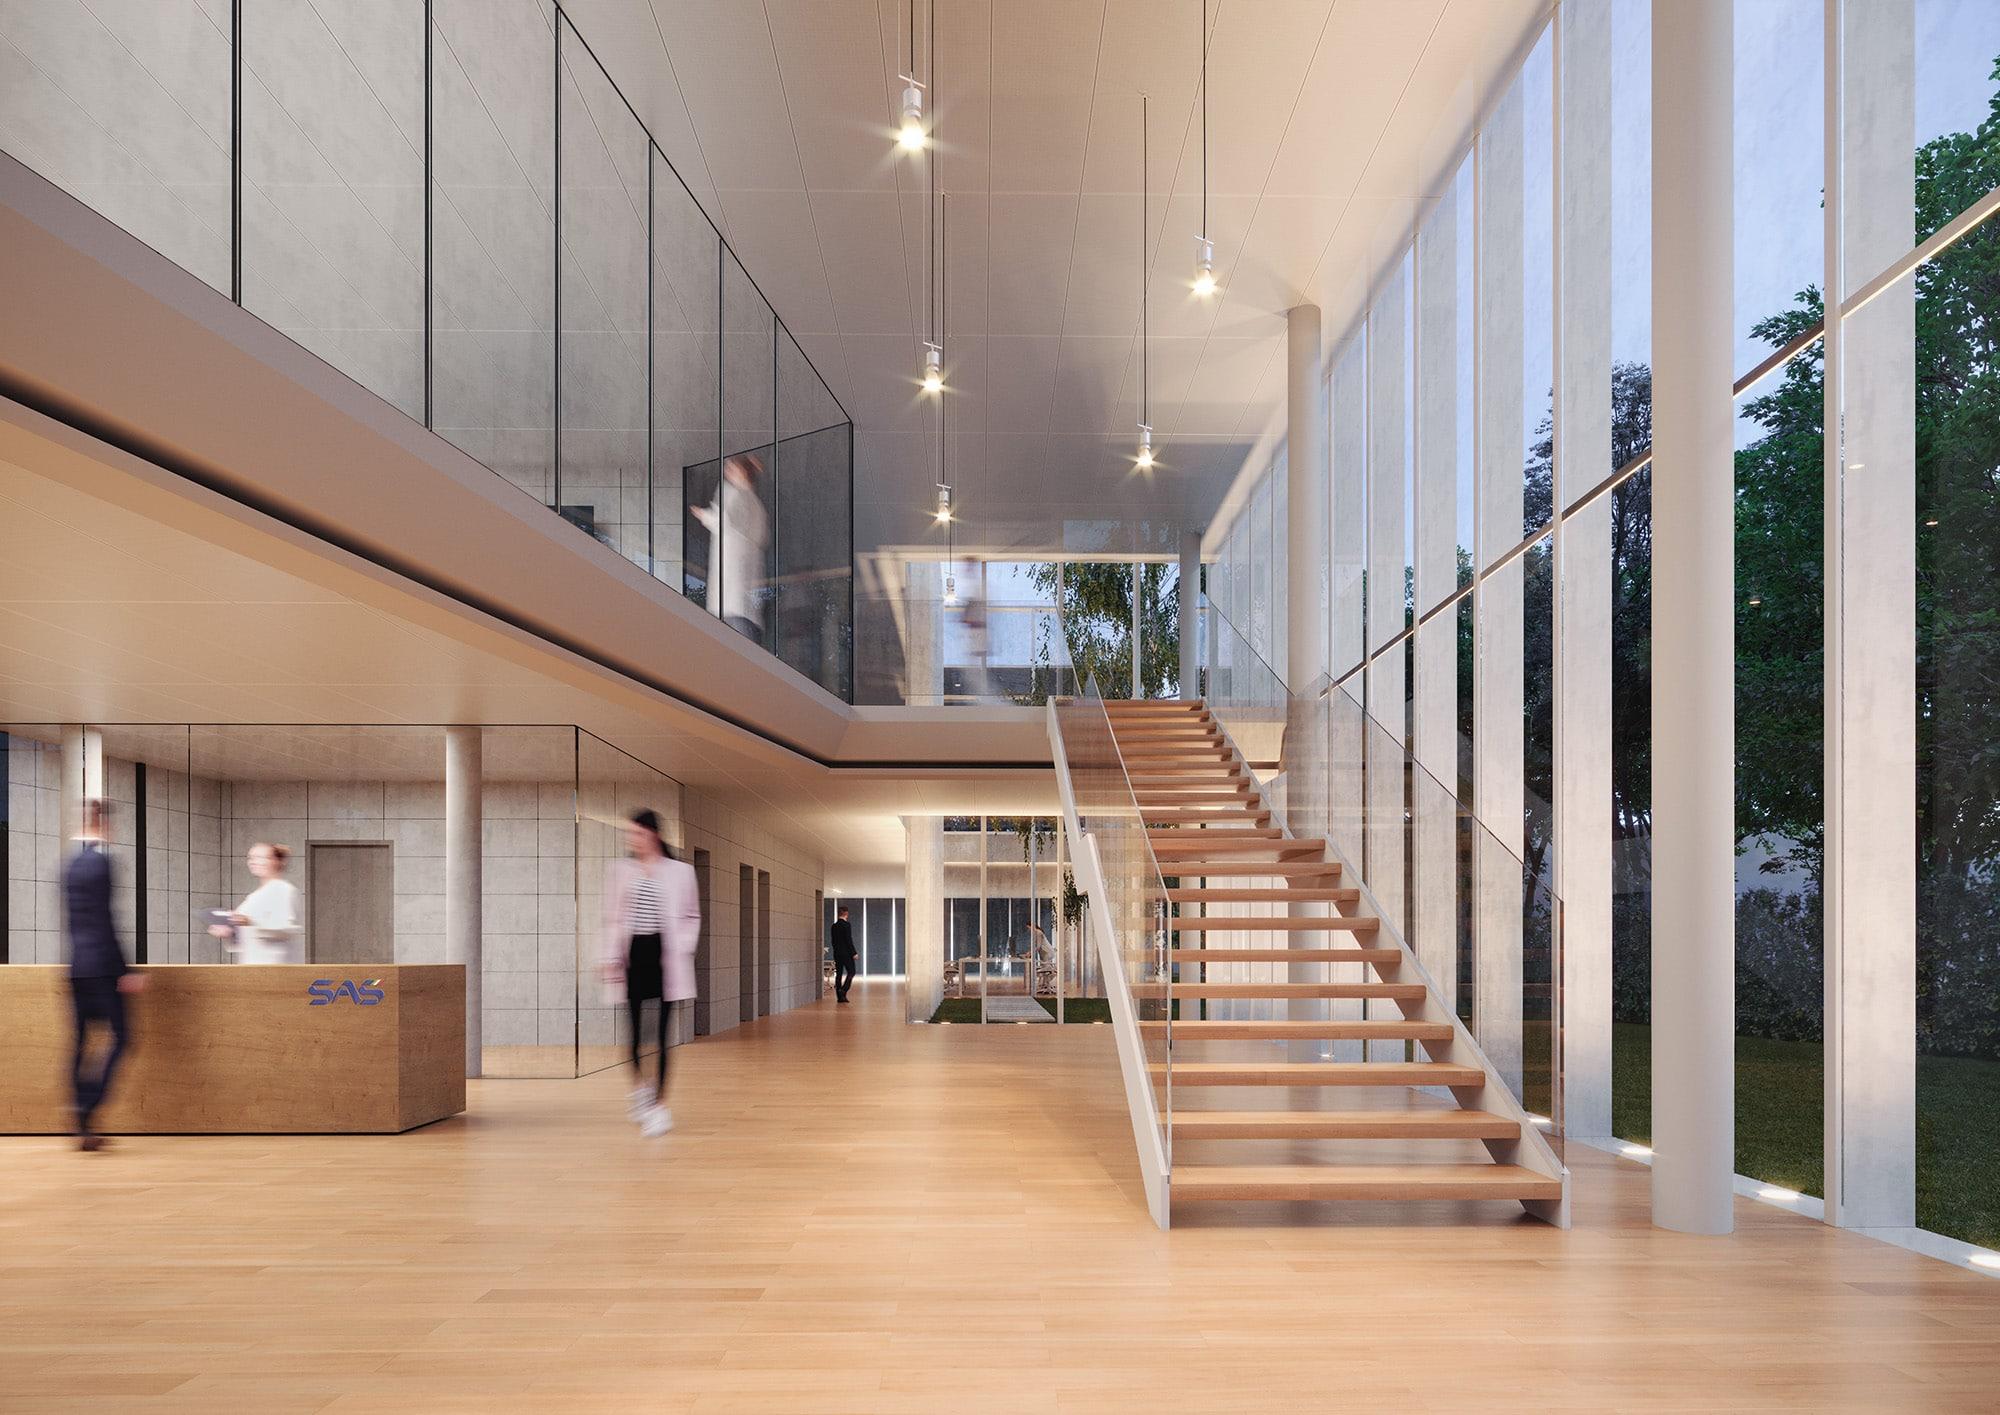 umberto_mauri_architetto_mauri_studio_lecco_headquarter_office_renovation_new_building_sketch_render_foyer_2000